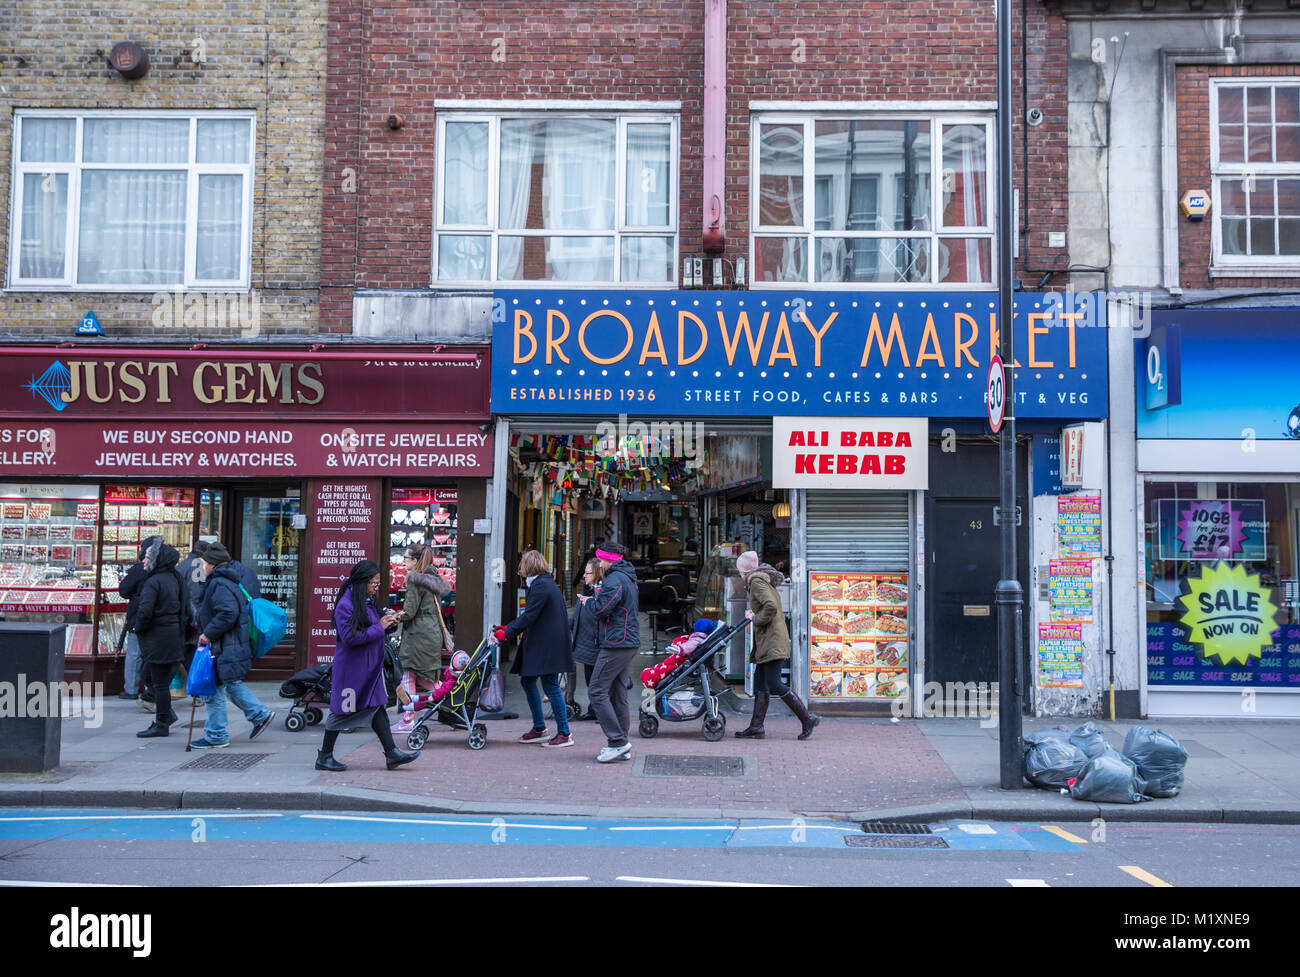 Tooting Broadway Market - Stock Image